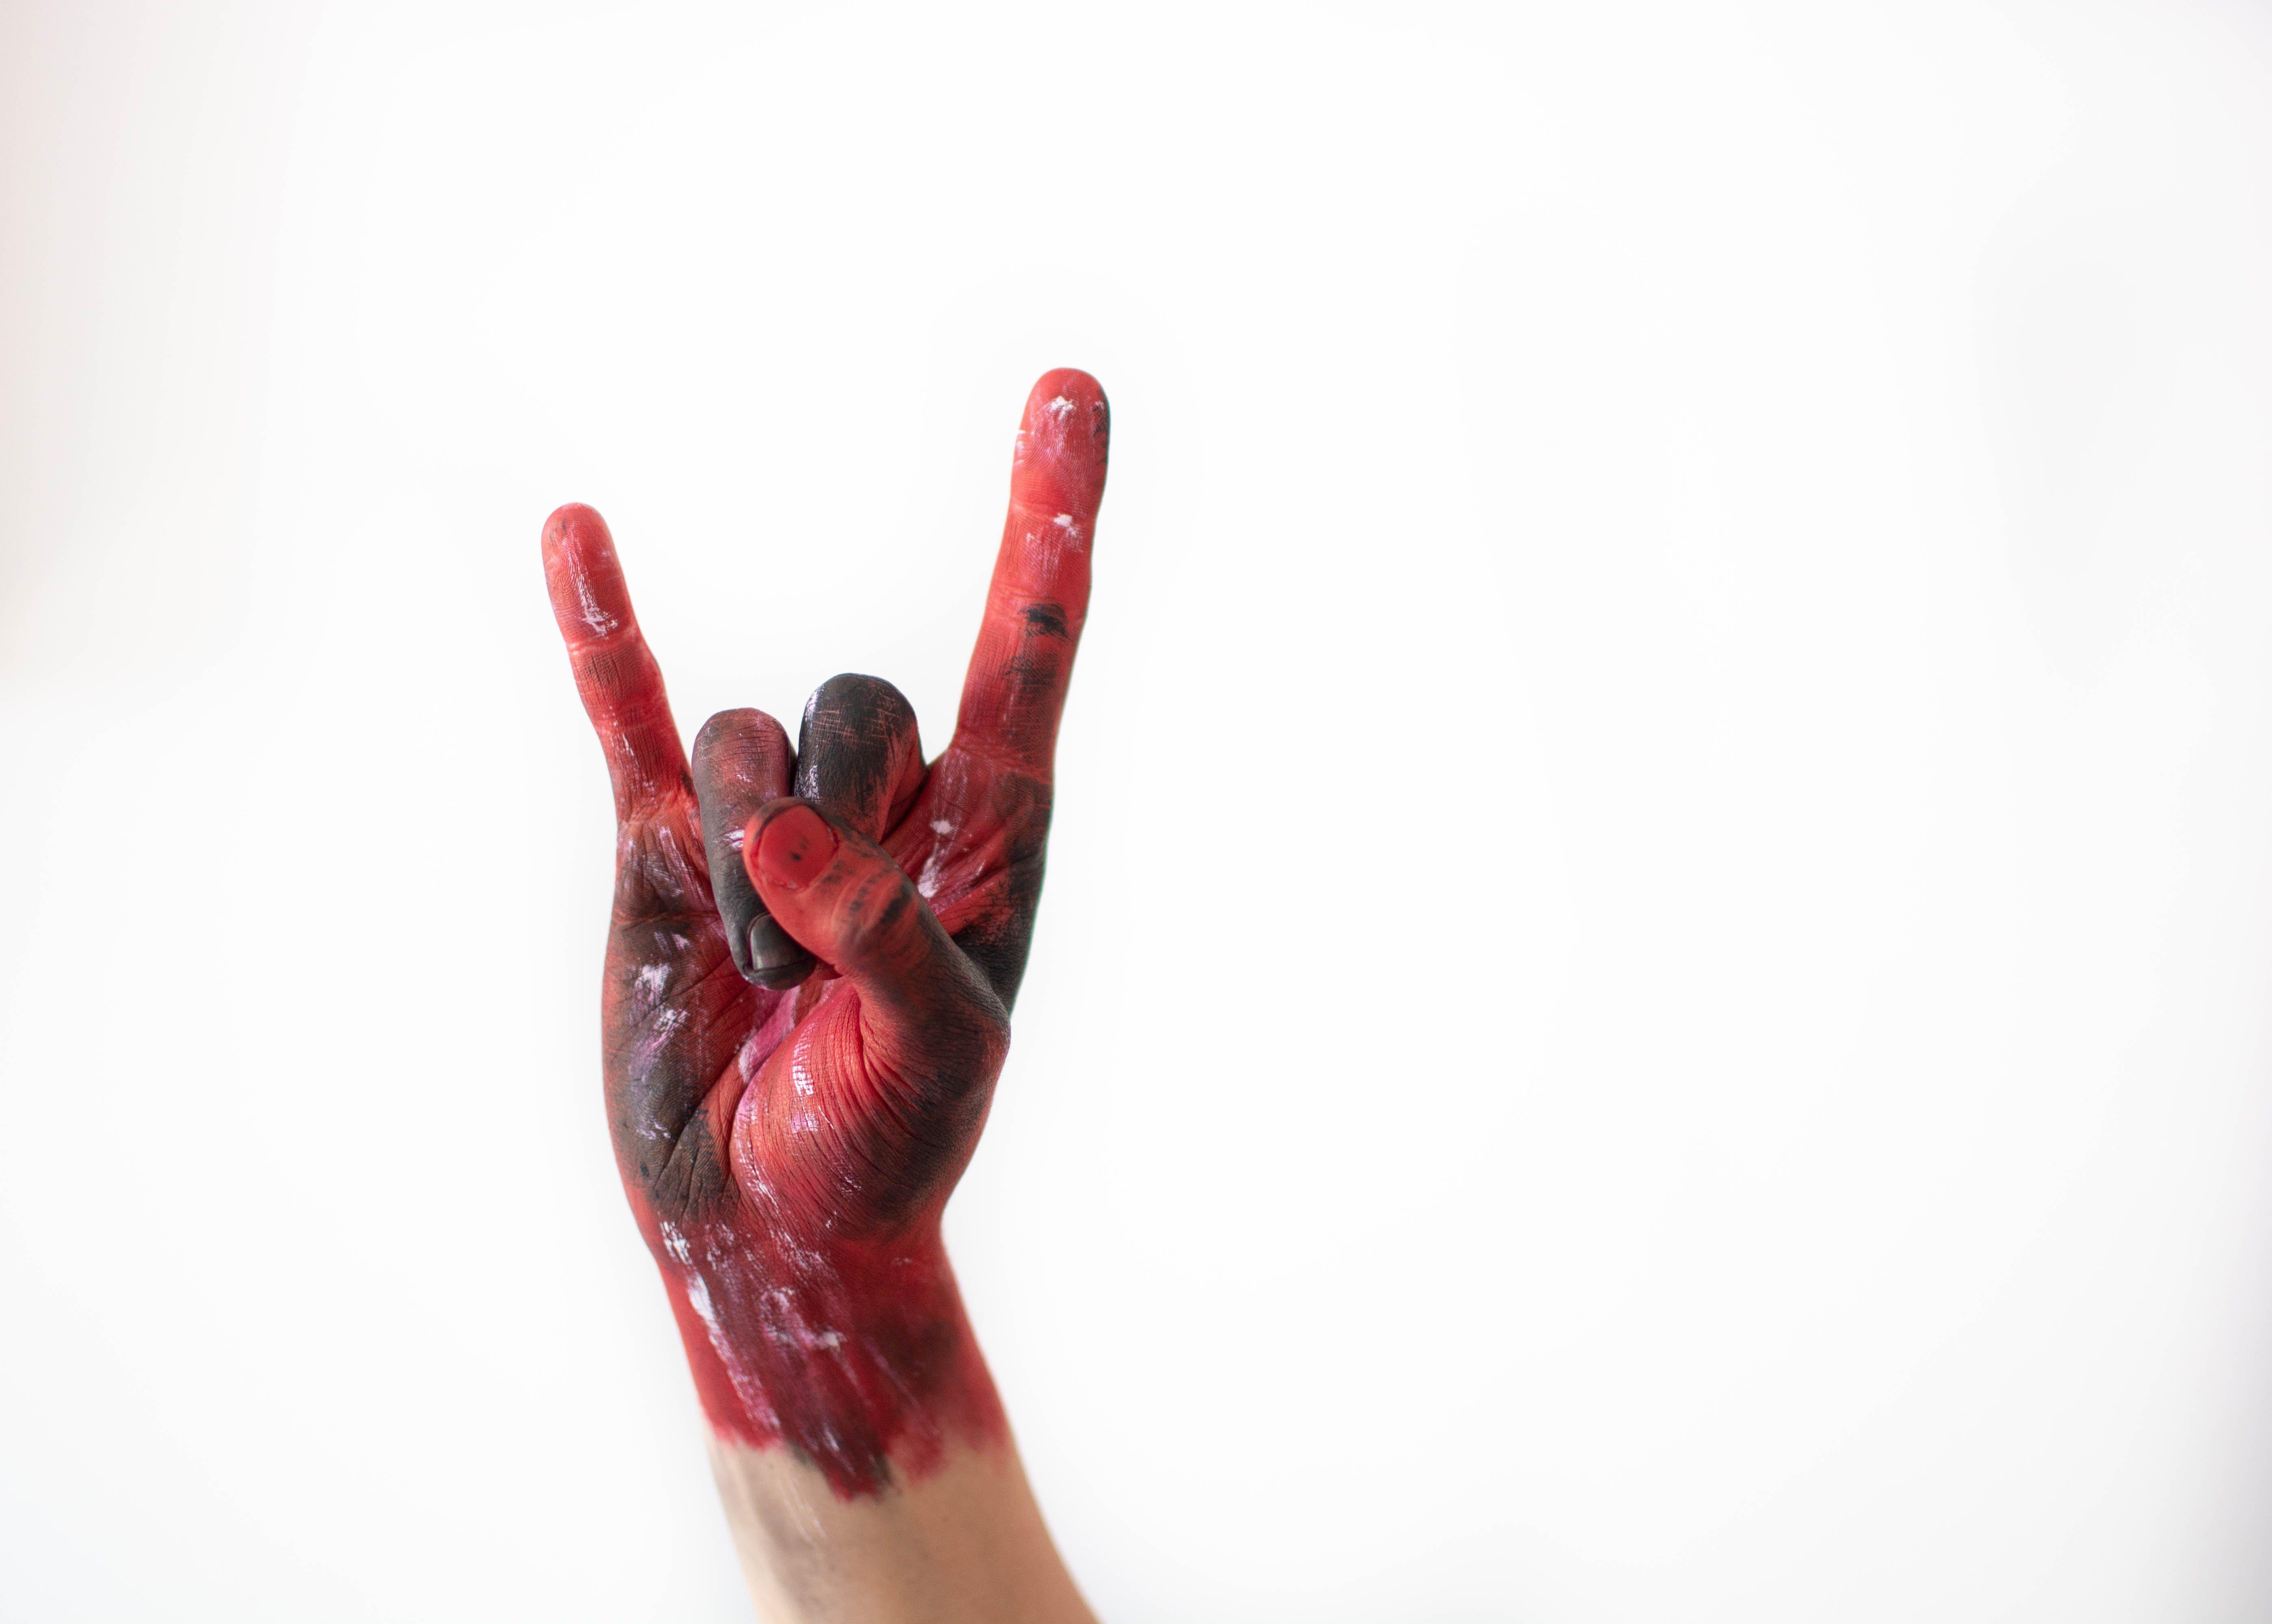 Gratis arkivbilde med design, farge, fingre, hånd